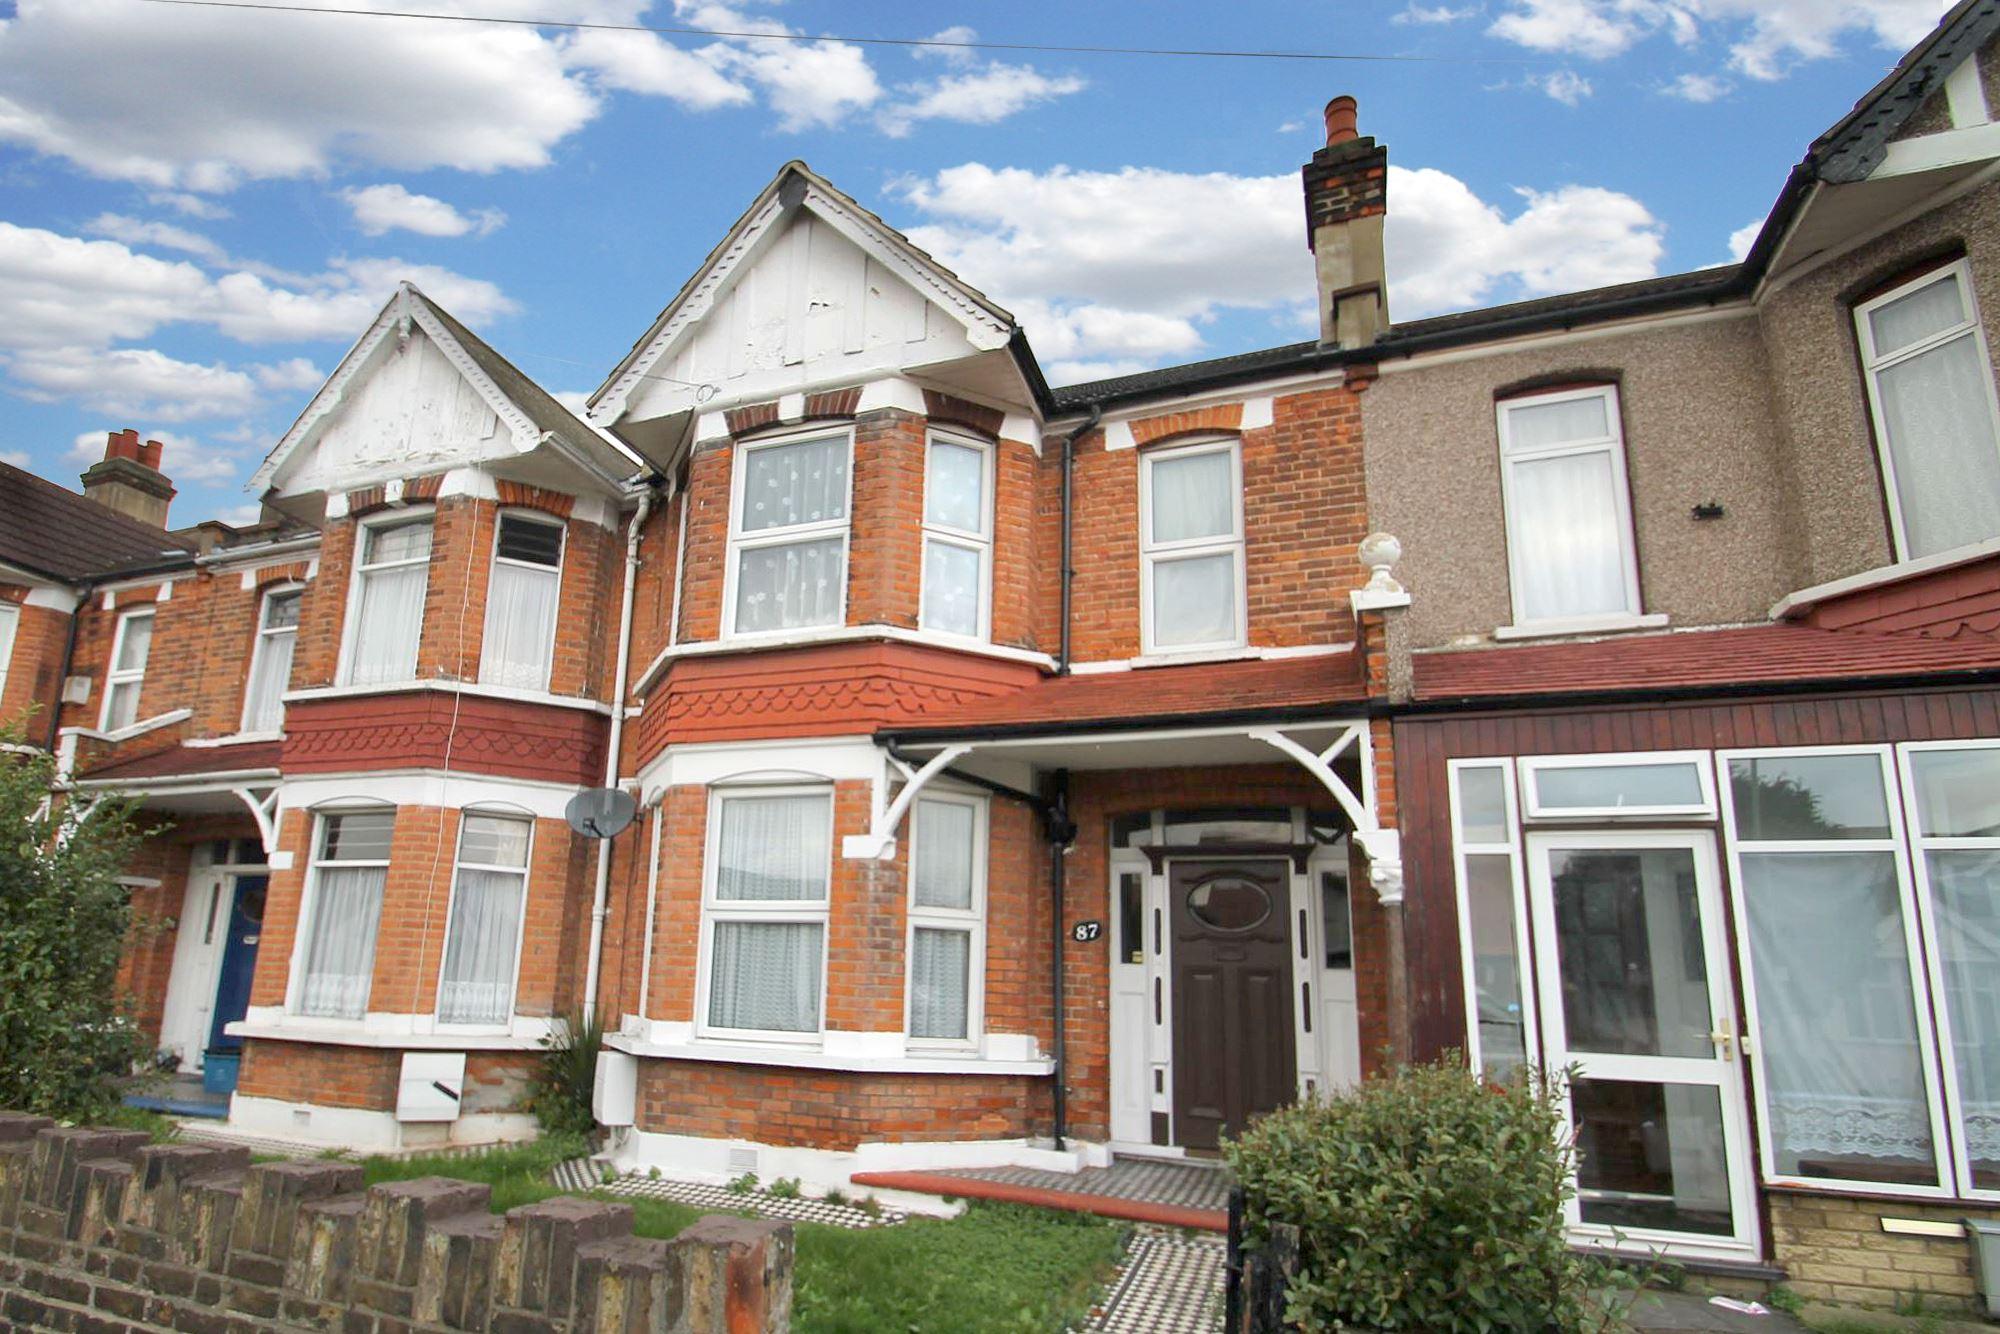 3 Bedroom Victorian House – Seven Kings IG3, £460,000.00